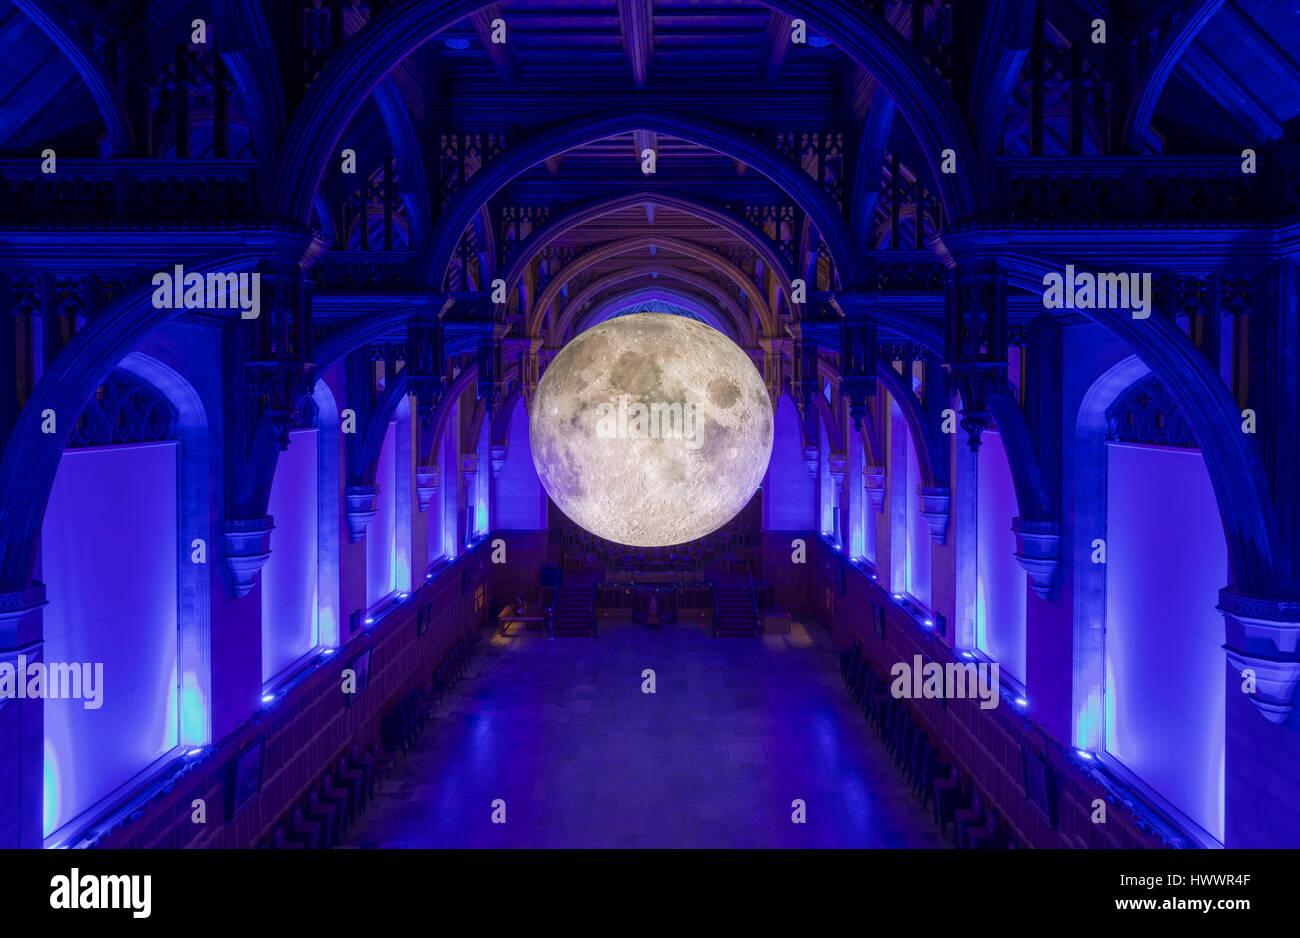 Bristol, UK. 23rd March 2017. Luke Jerram's Museum of the Moon at the University of Bristol, Bristol, UK A large - Stock Image